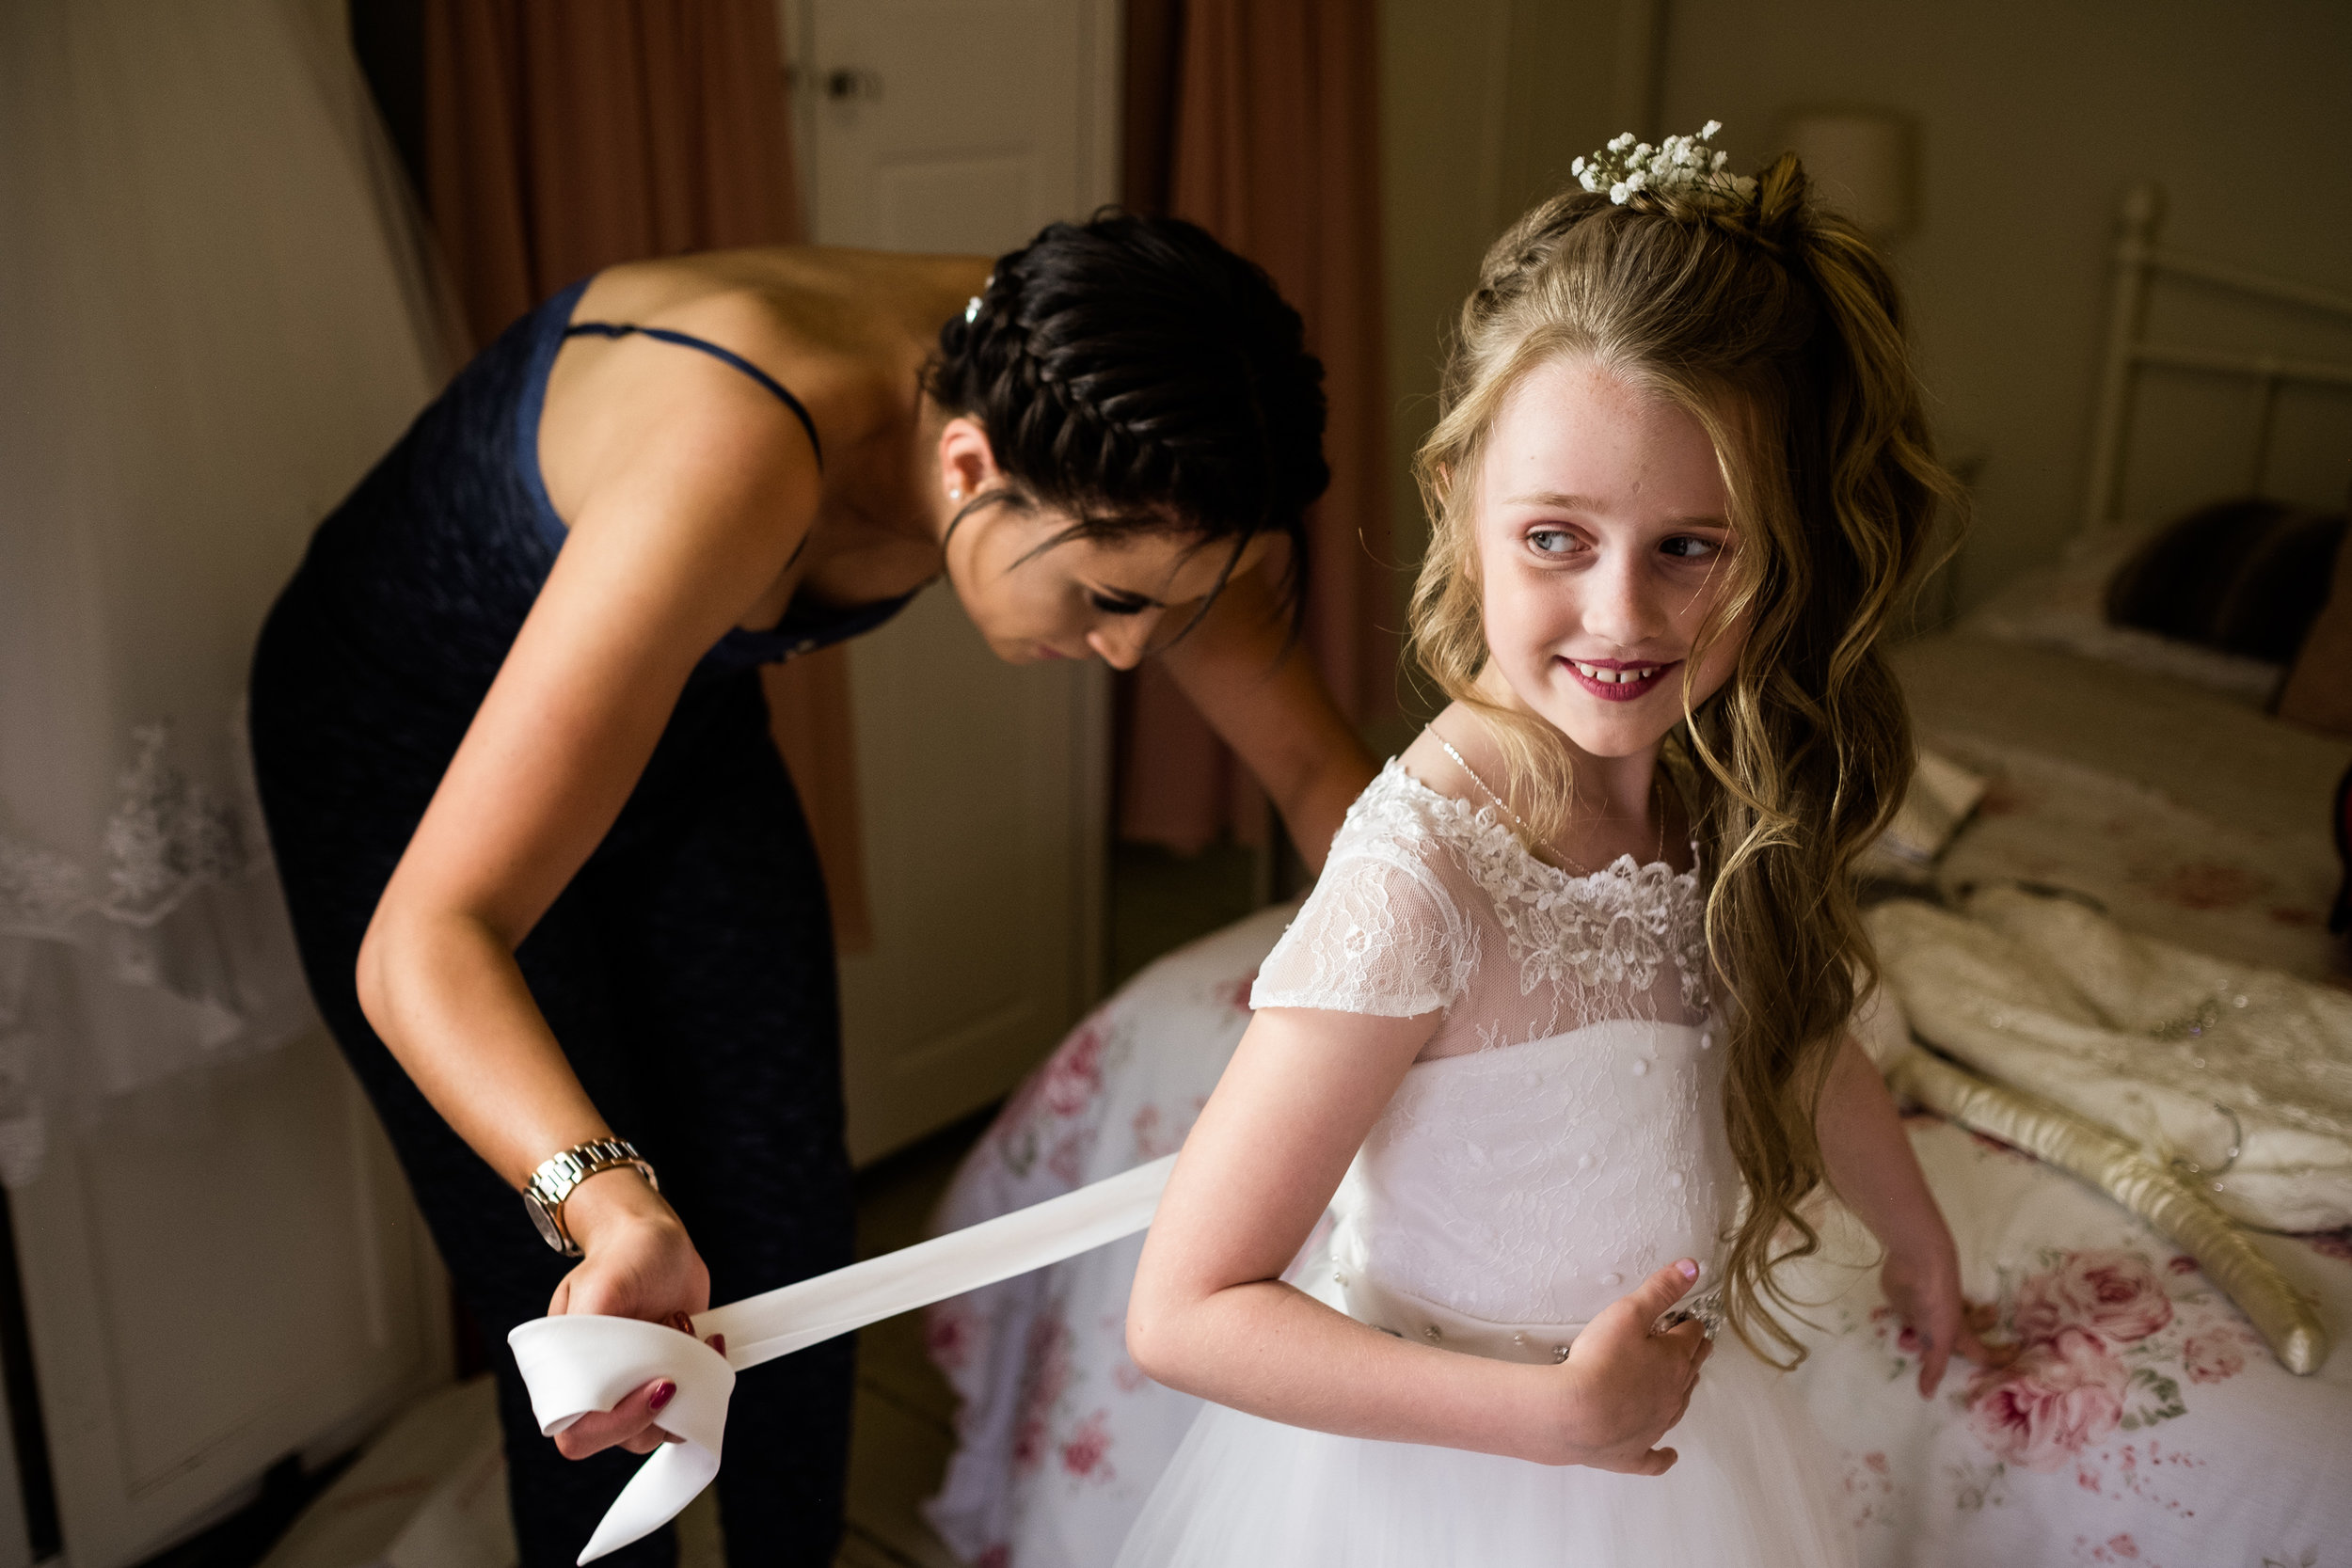 Summer Documentary Wedding Photography Floral Hall, Stoke-on-Trent, Staffordshire - Jenny Harper-14.jpg